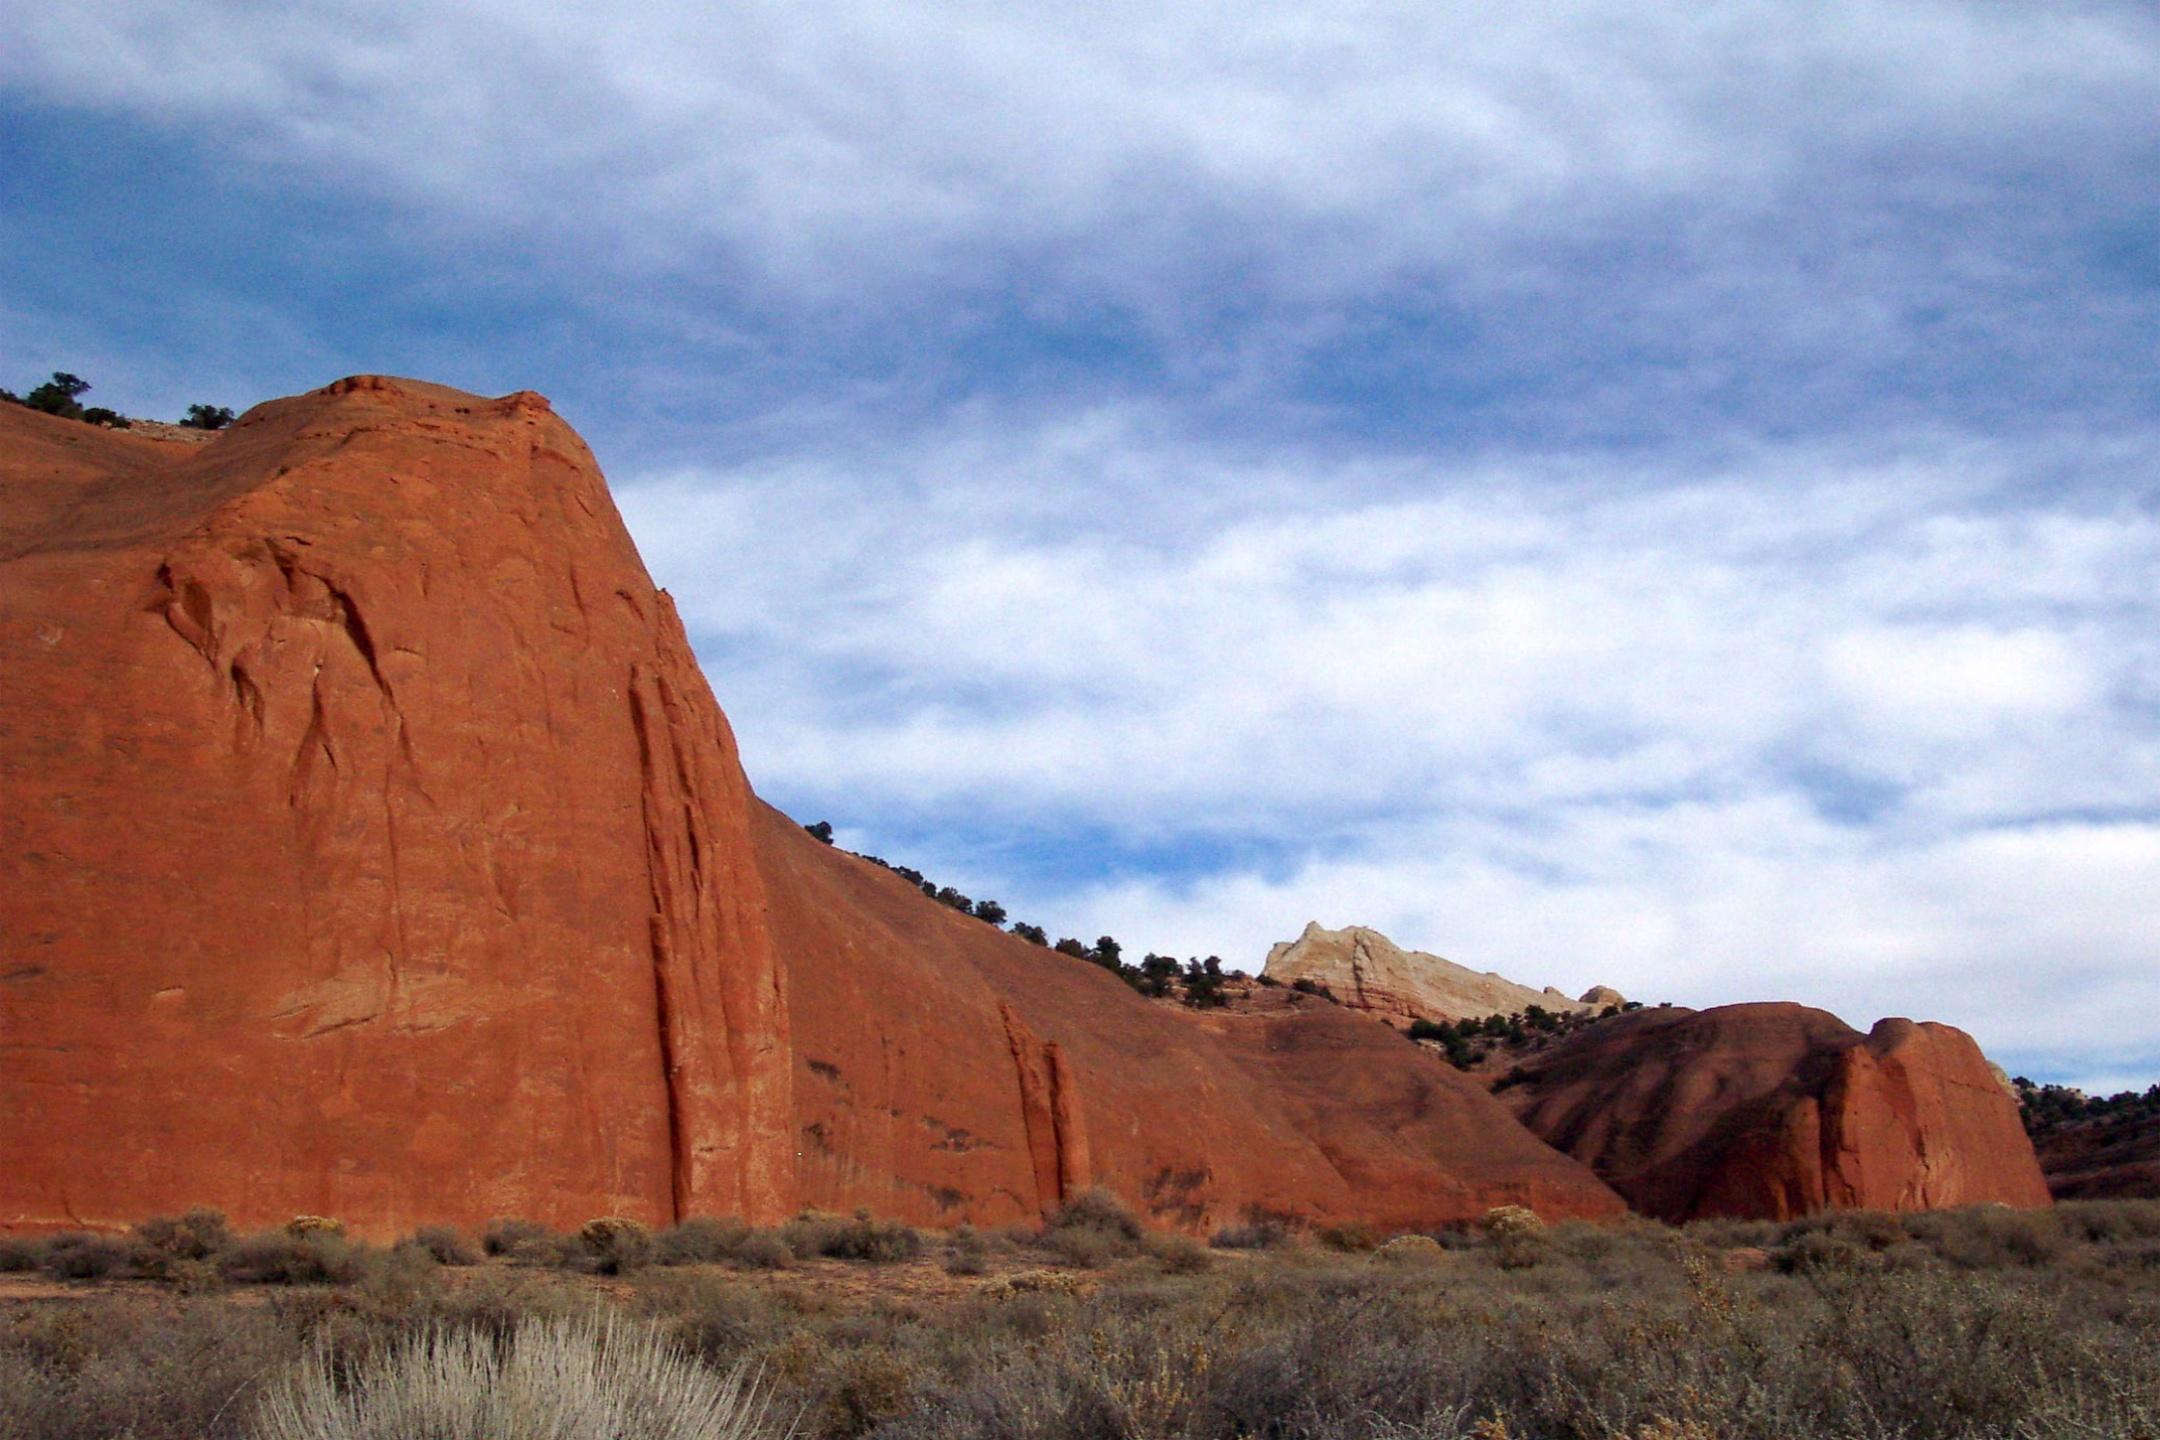 Thoreau red rock cliffs